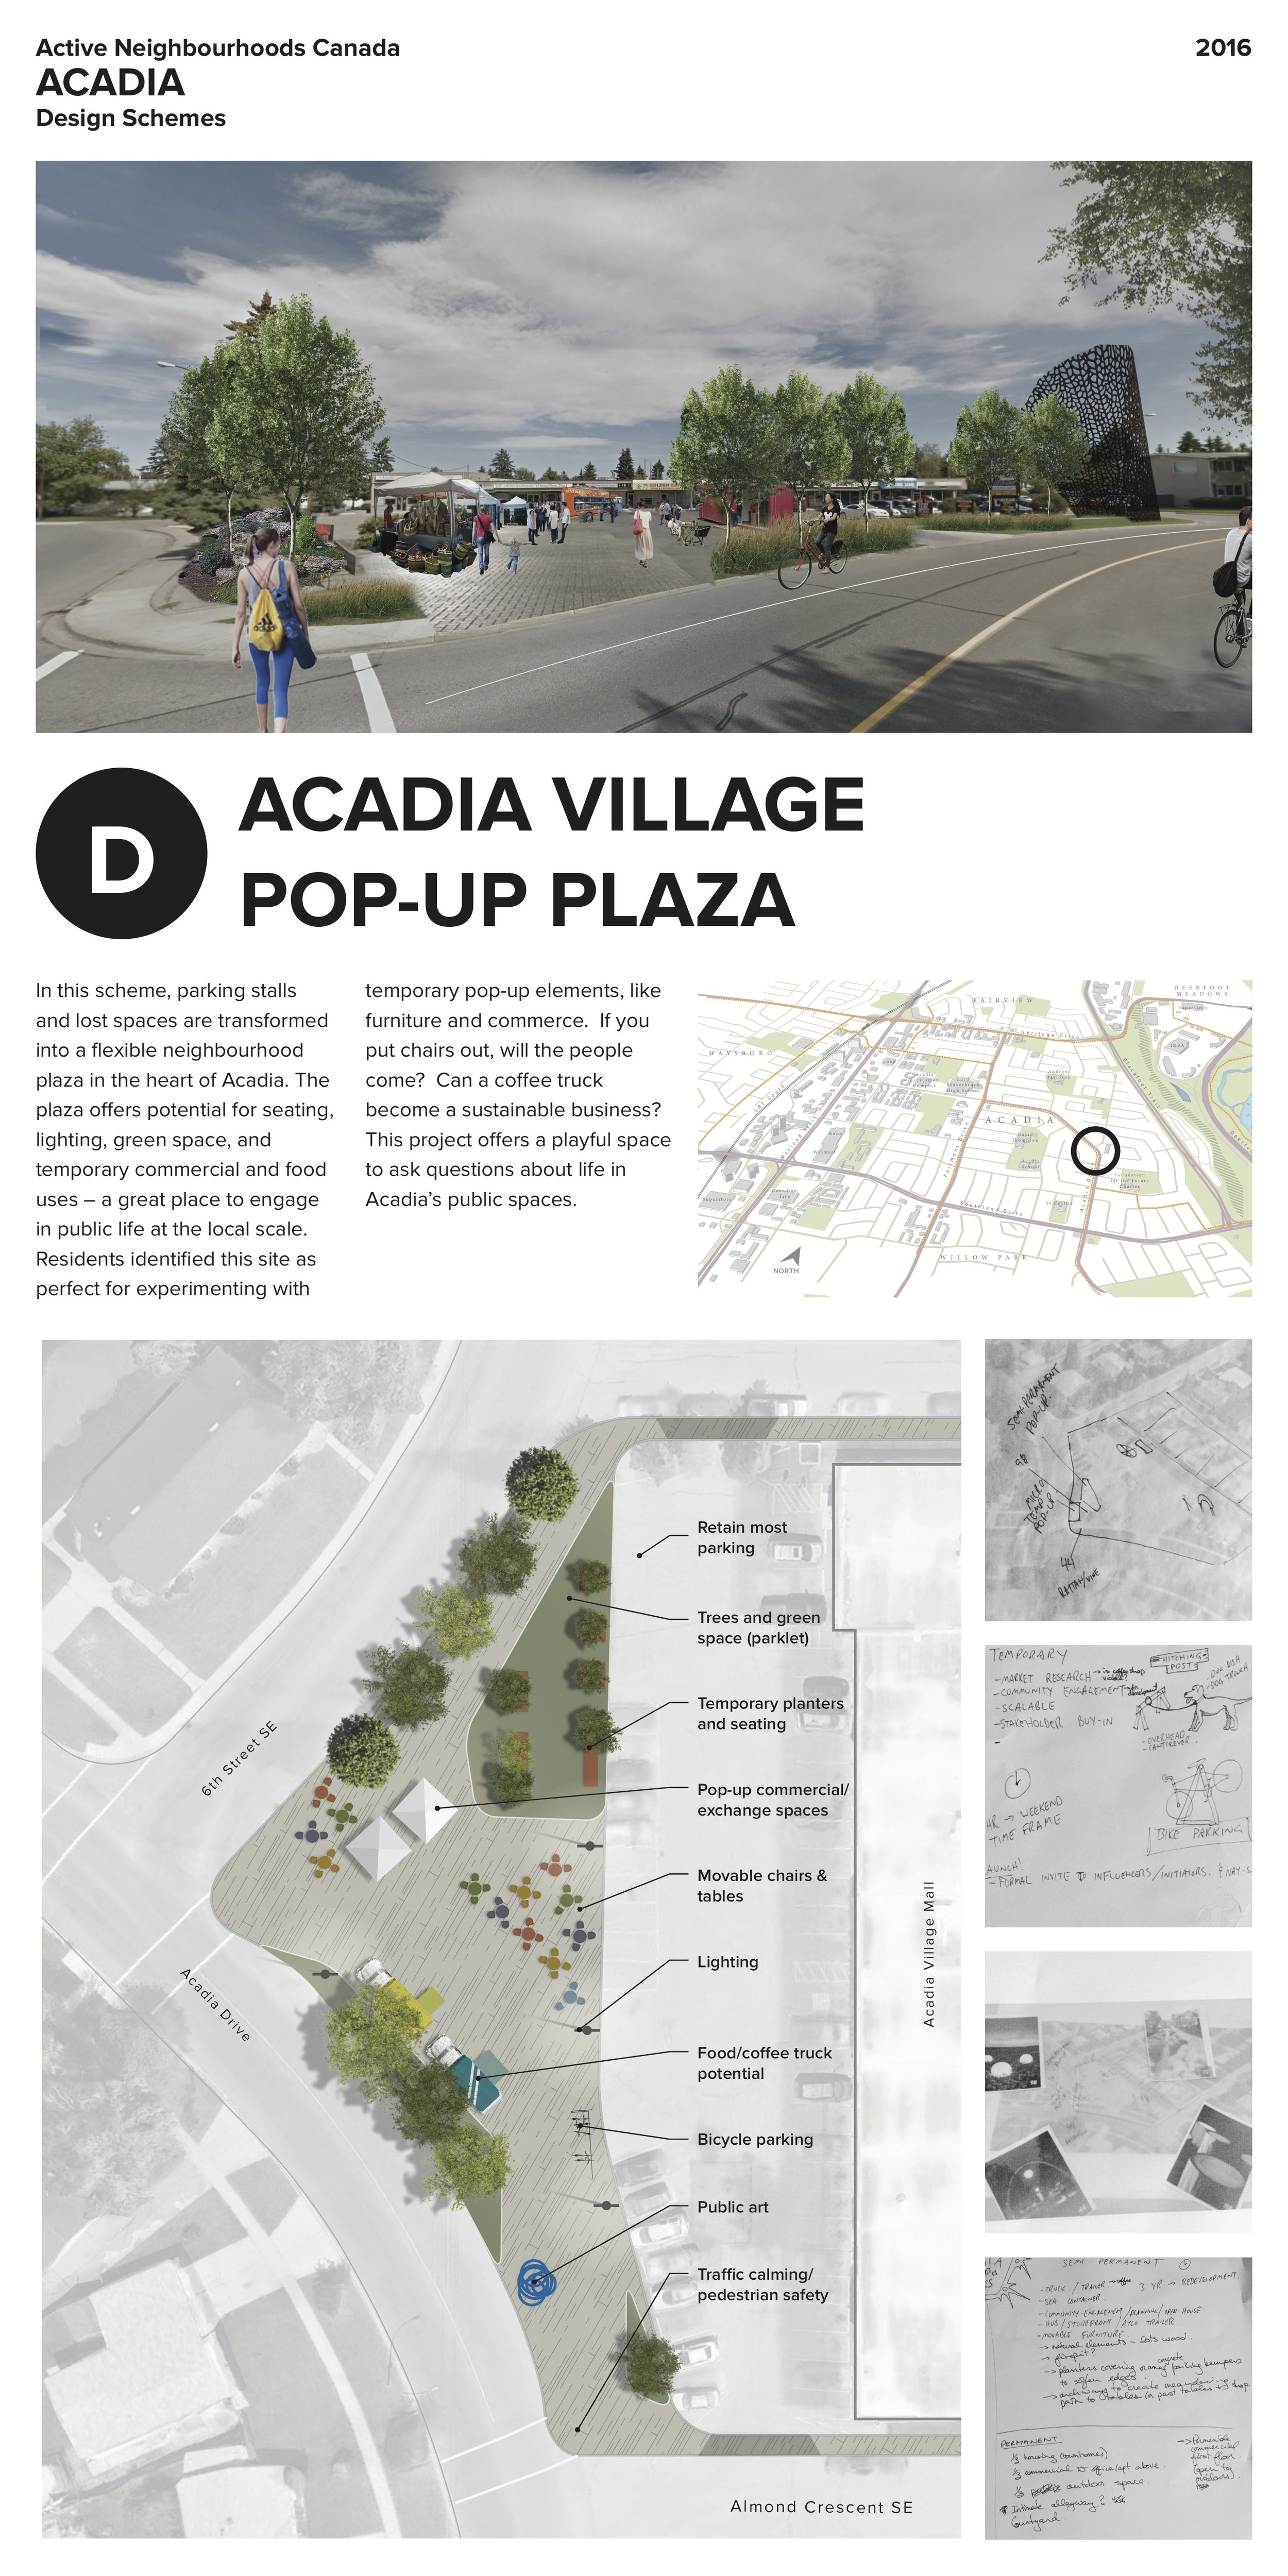 Acadia Scheme page 5.jpg